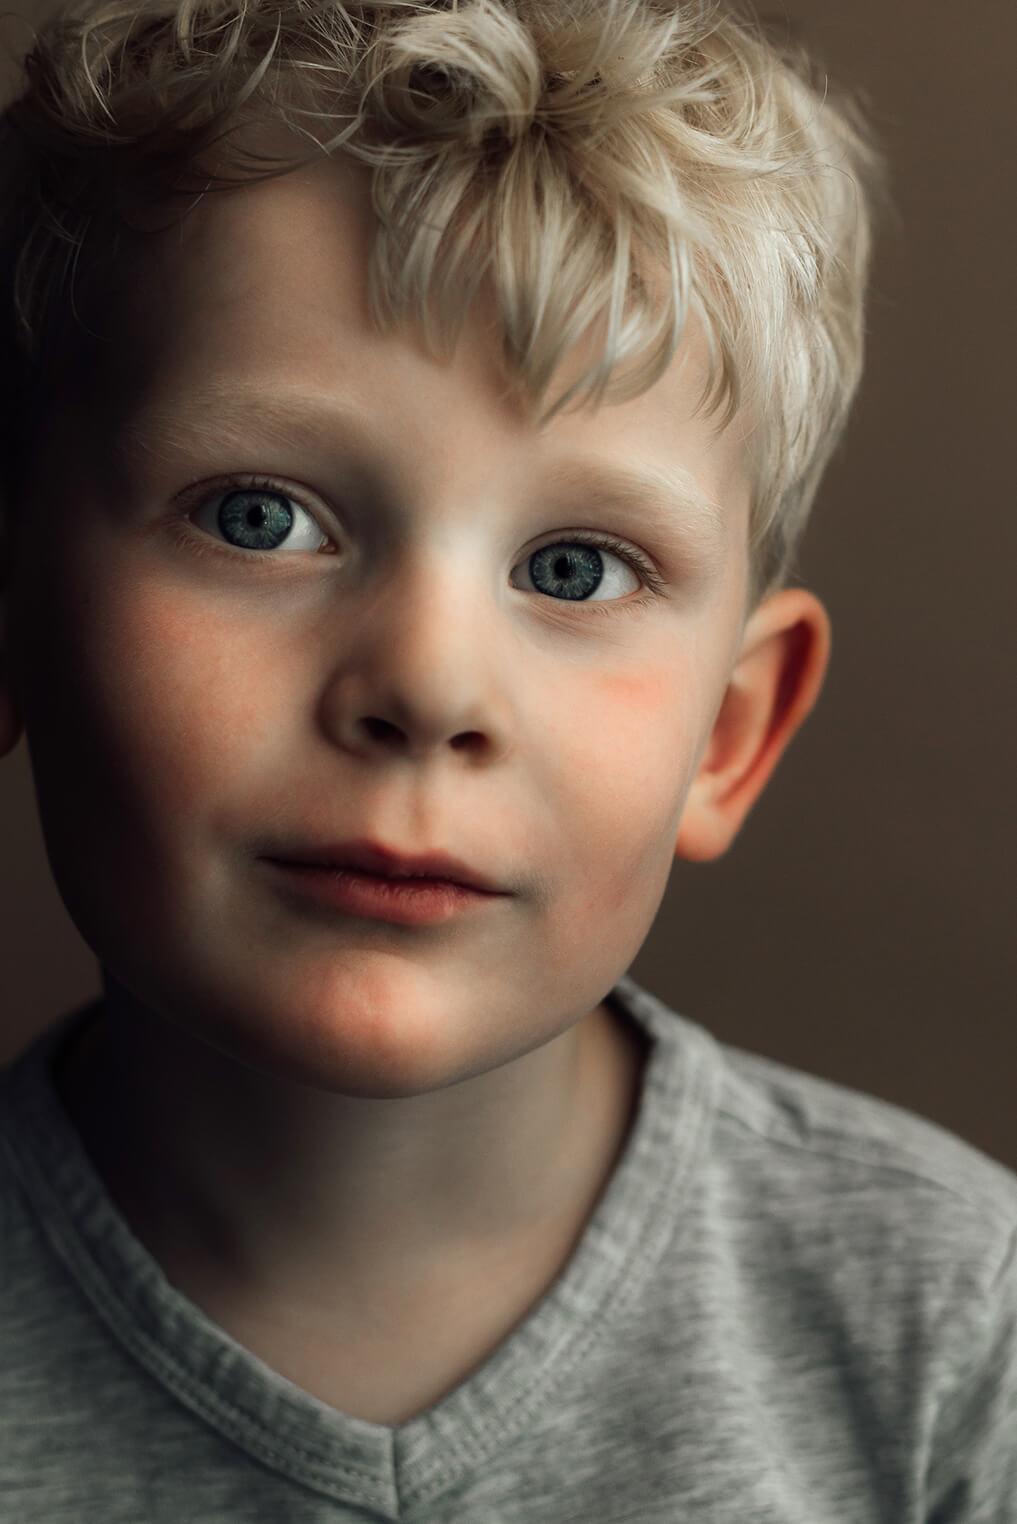 kinderportret close-up jongen